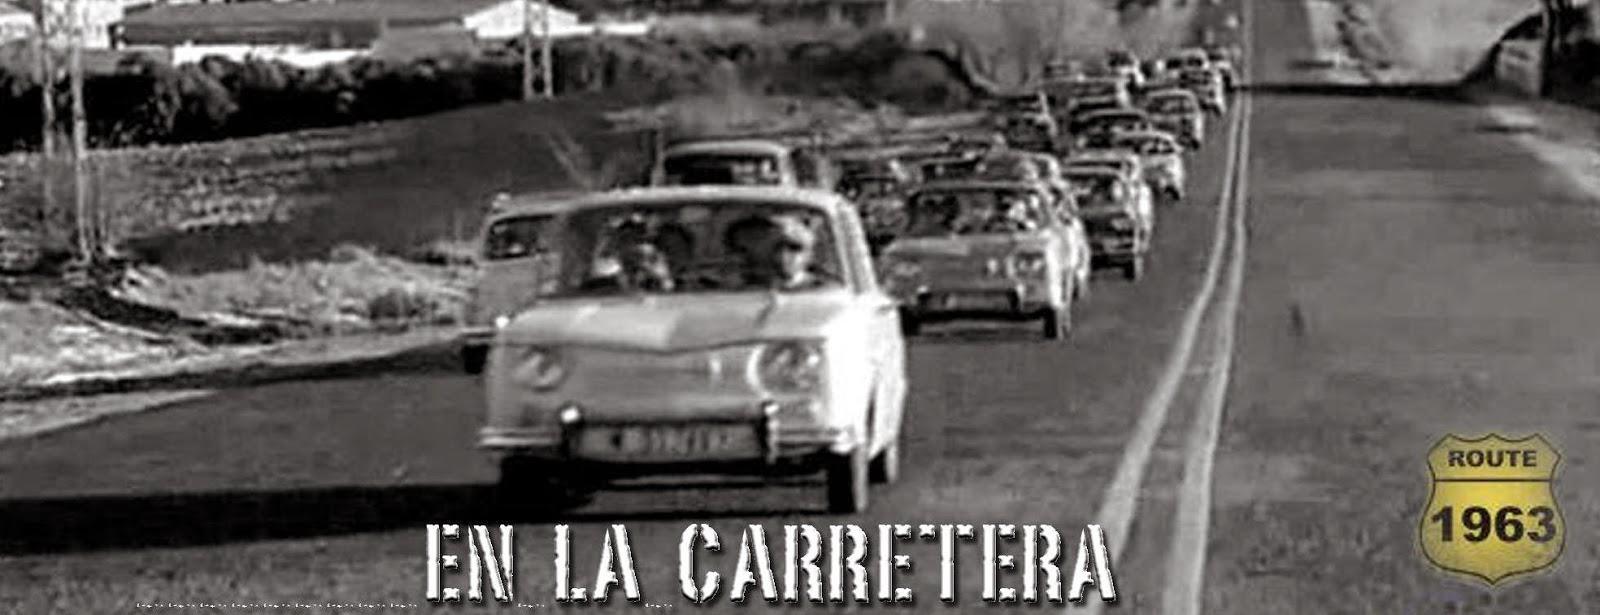 EN LA CARRETERA. Blog principal.